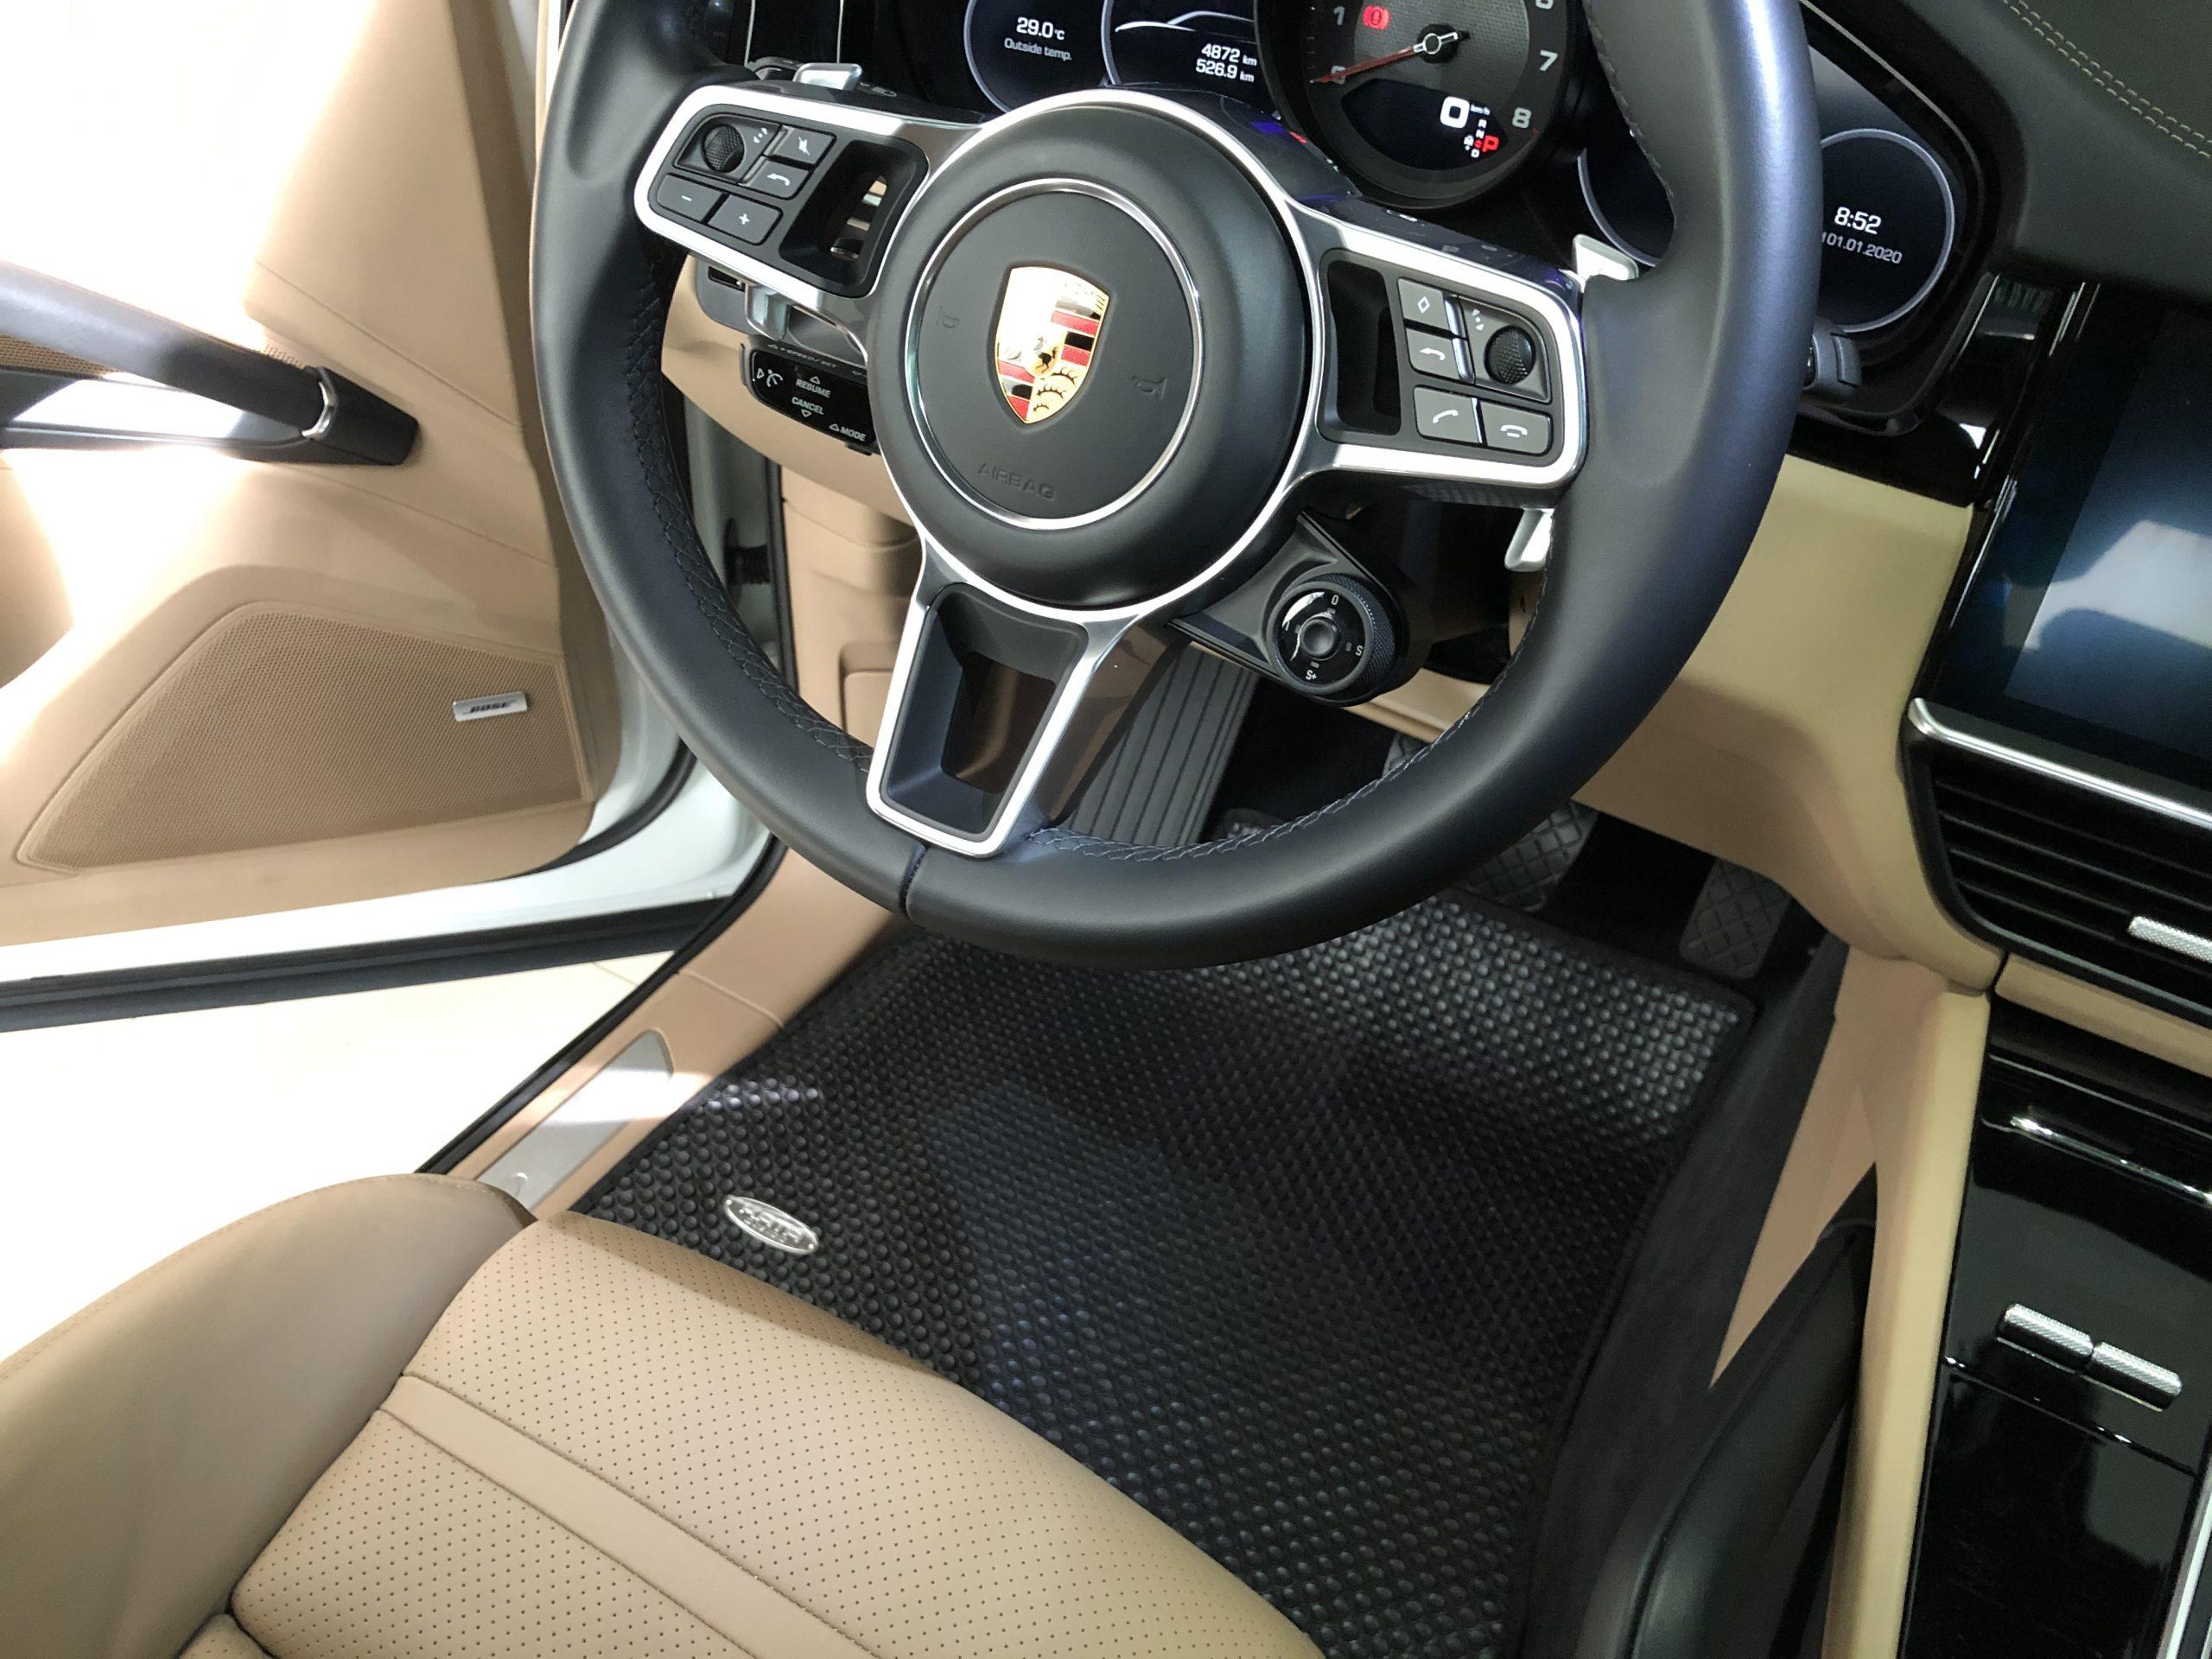 Thảm lót sàn Porsche Cayenne 2018